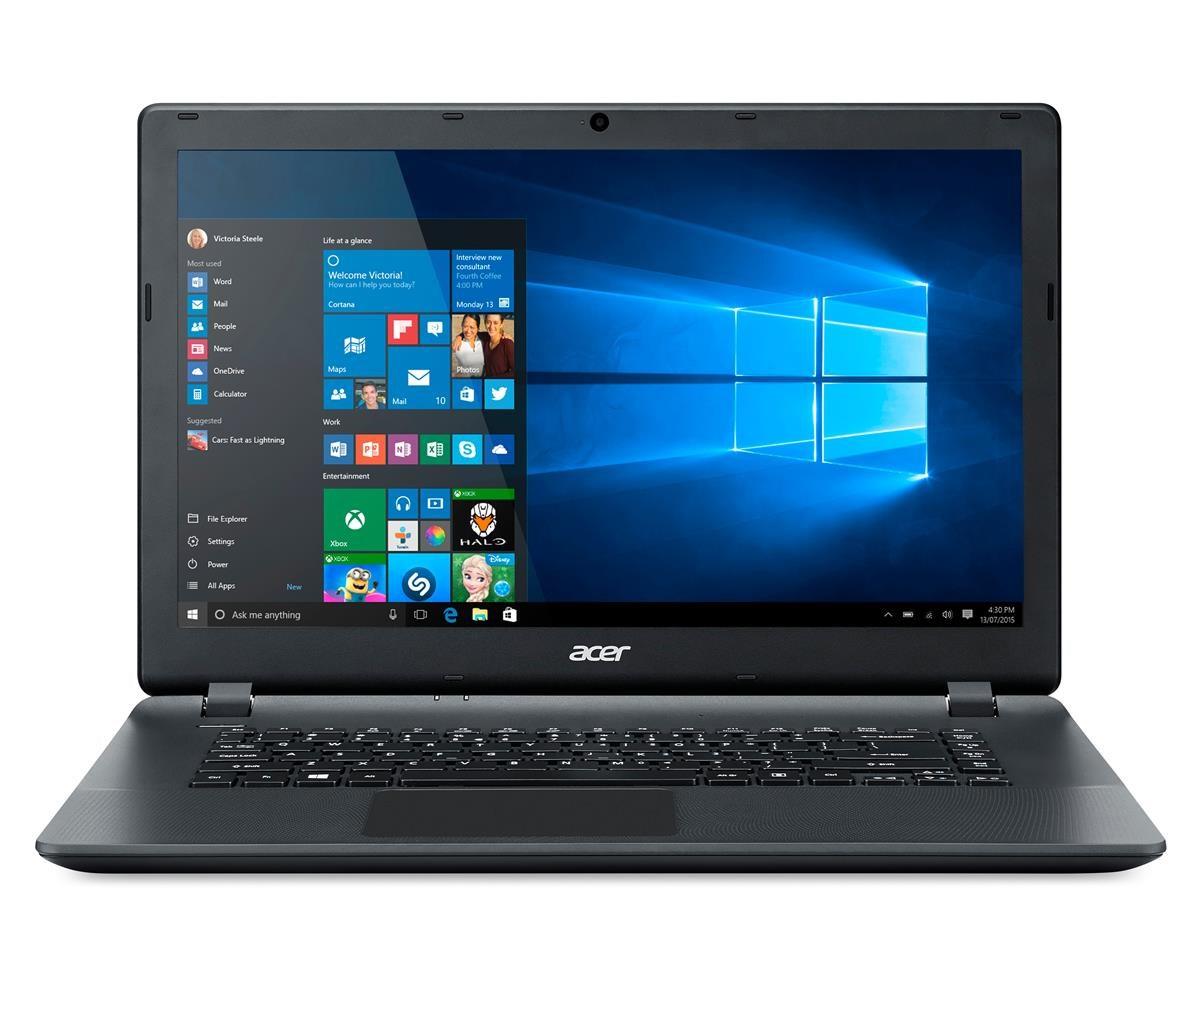 Acer Aspire ES1-572-57AQ (15.6 inch) Notebook Core i5 ...